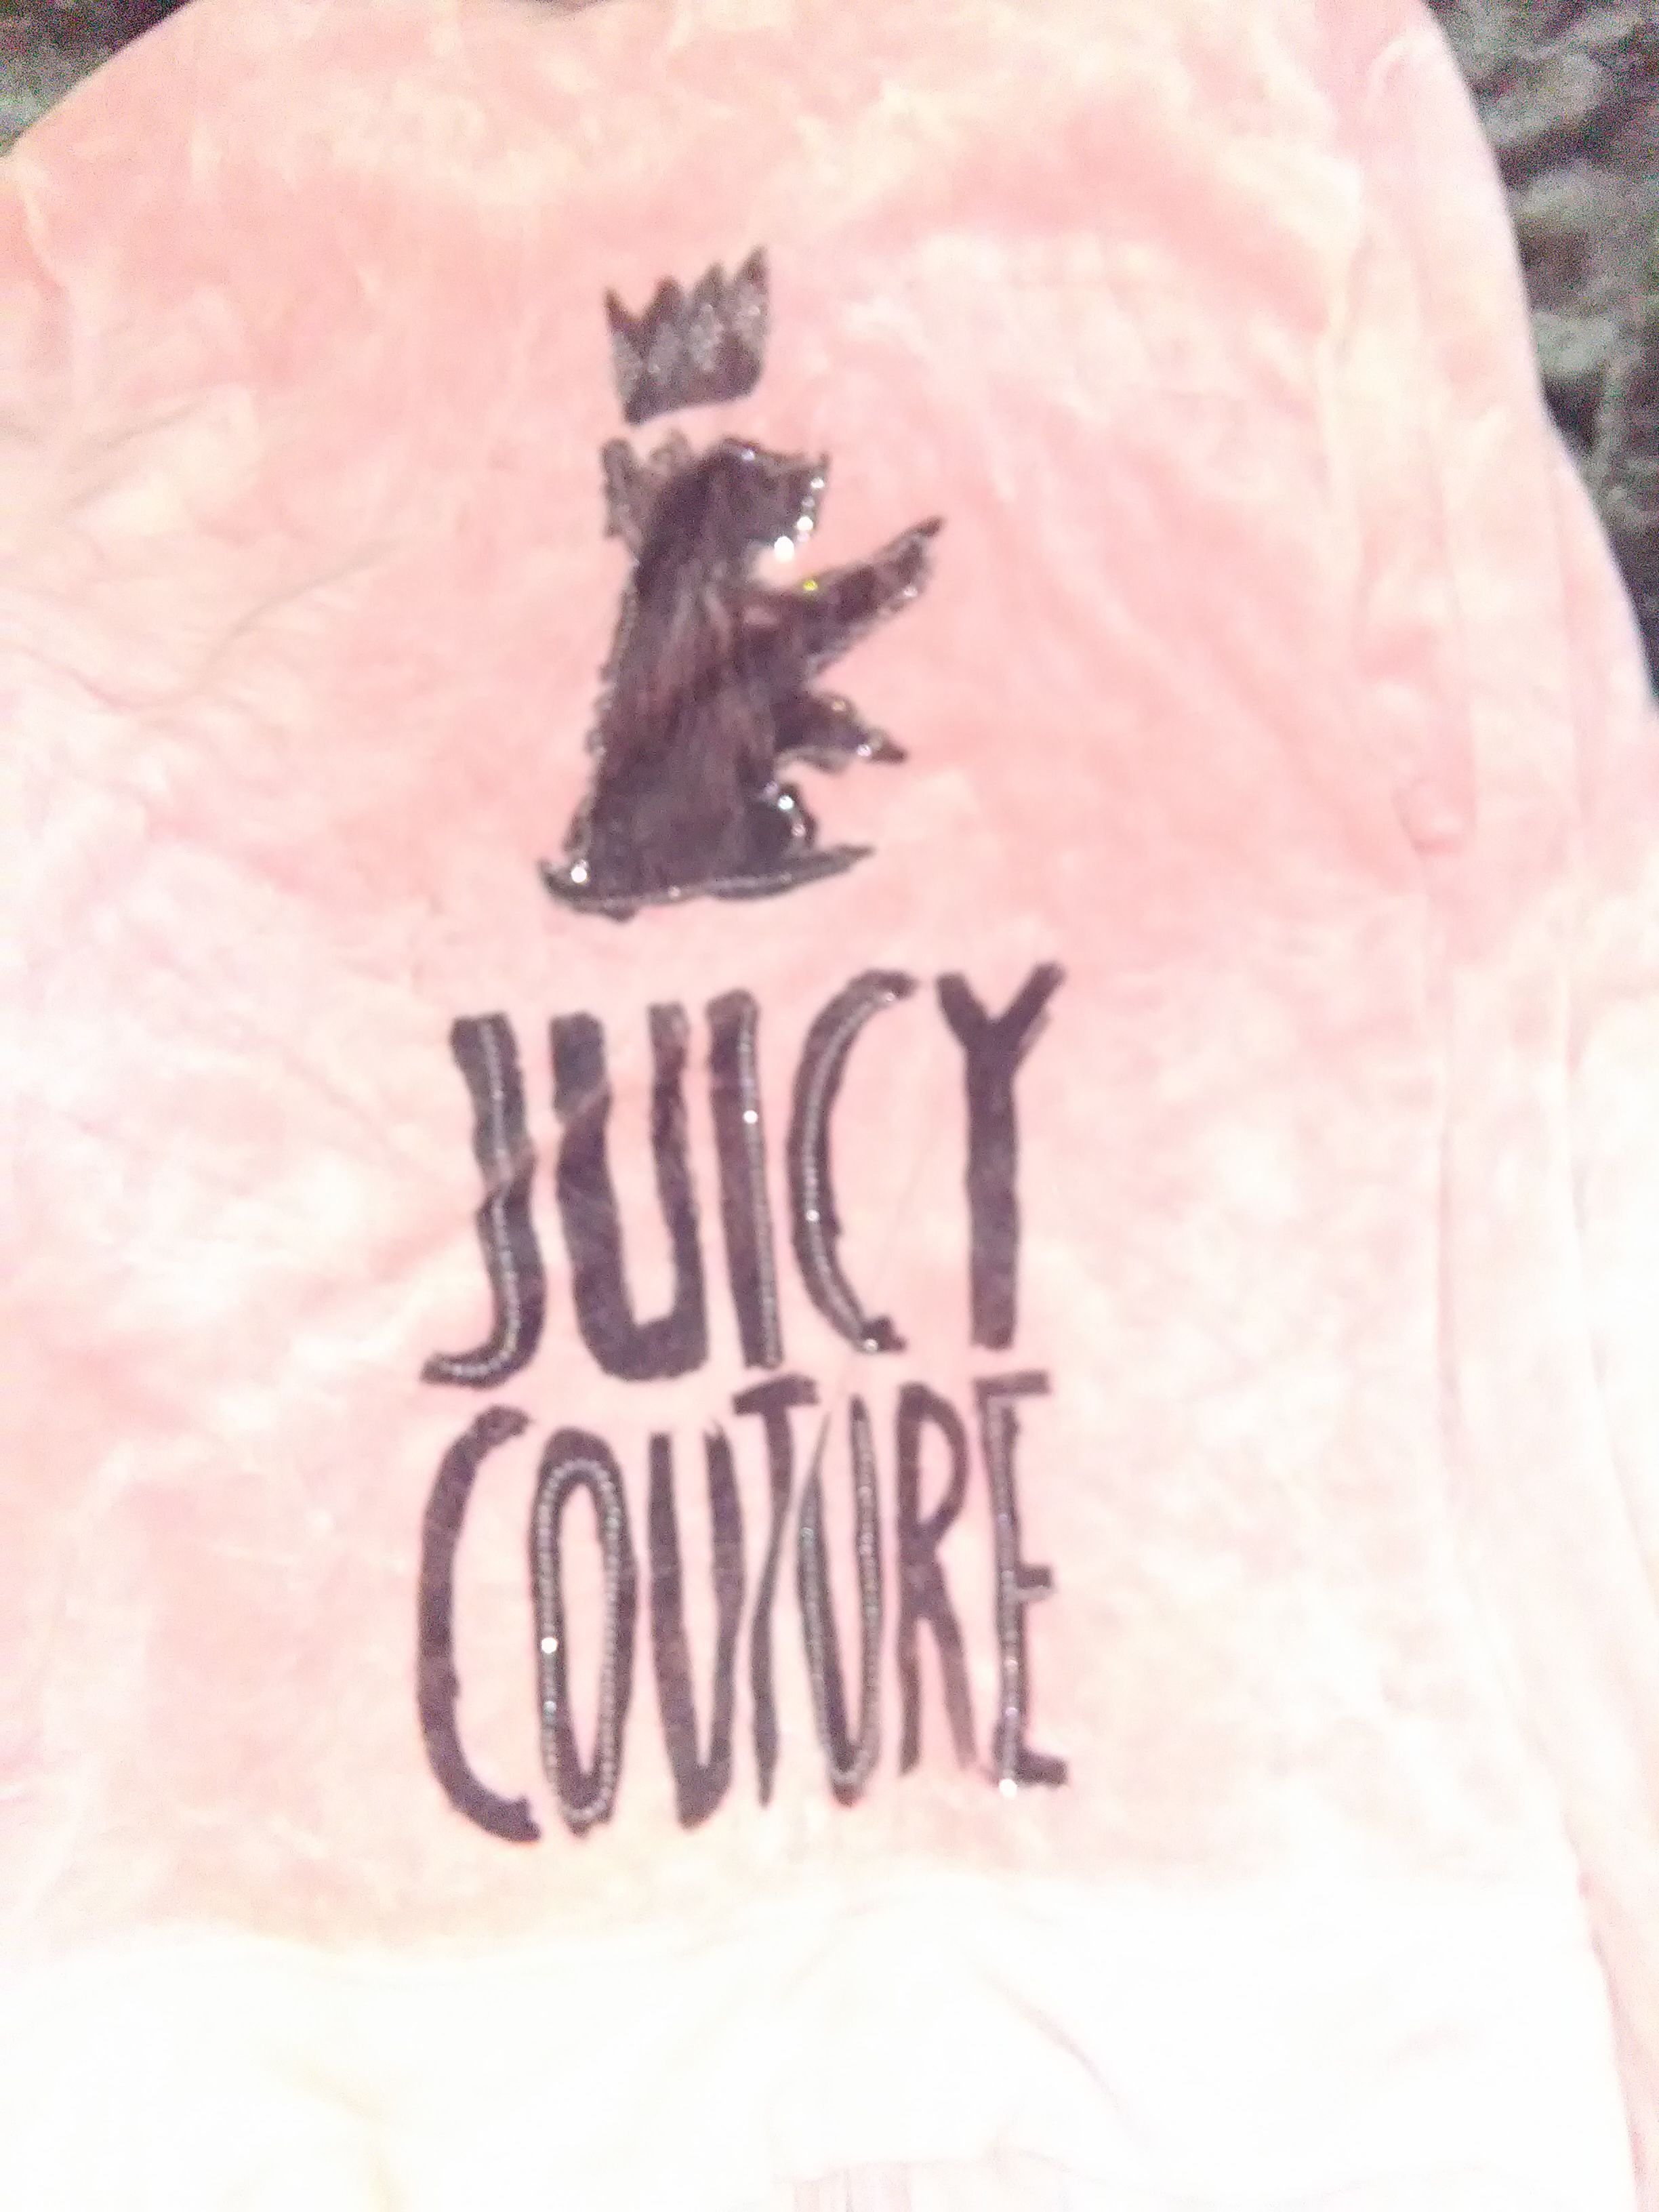 Juicy sweater